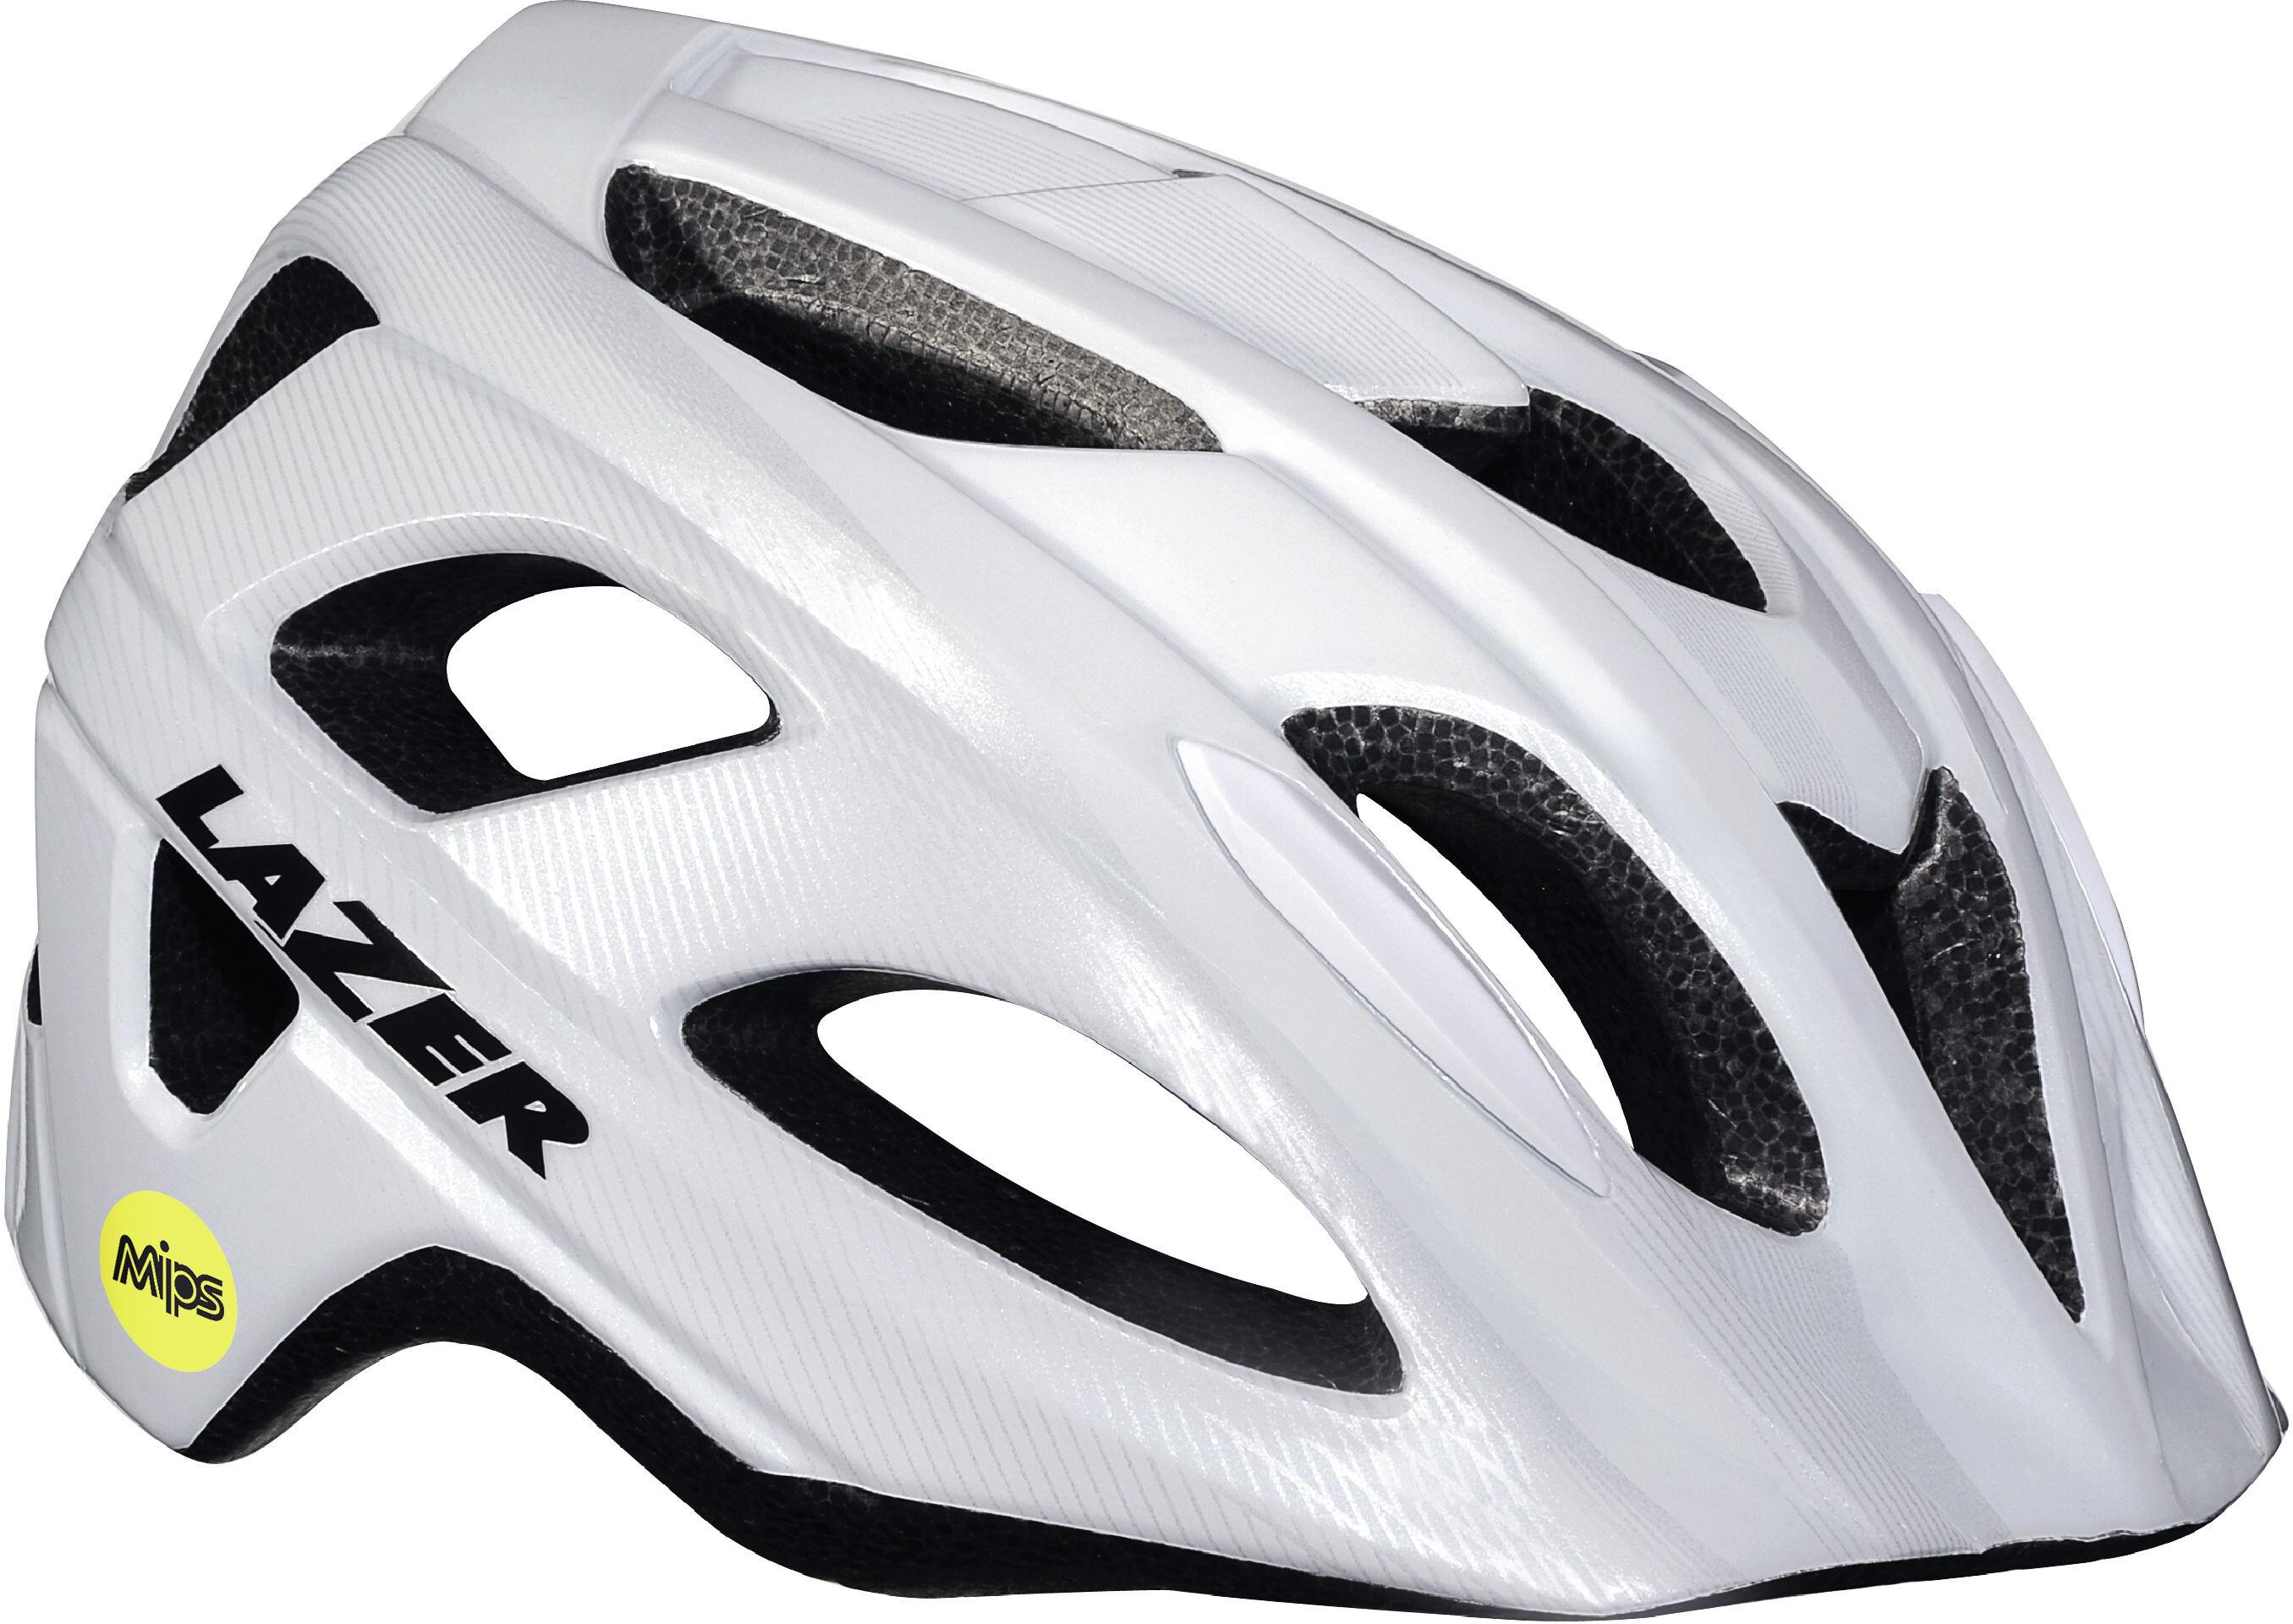 Lazer Beam casco per bici MIPS bianco su Bikester 1309fa11298b2